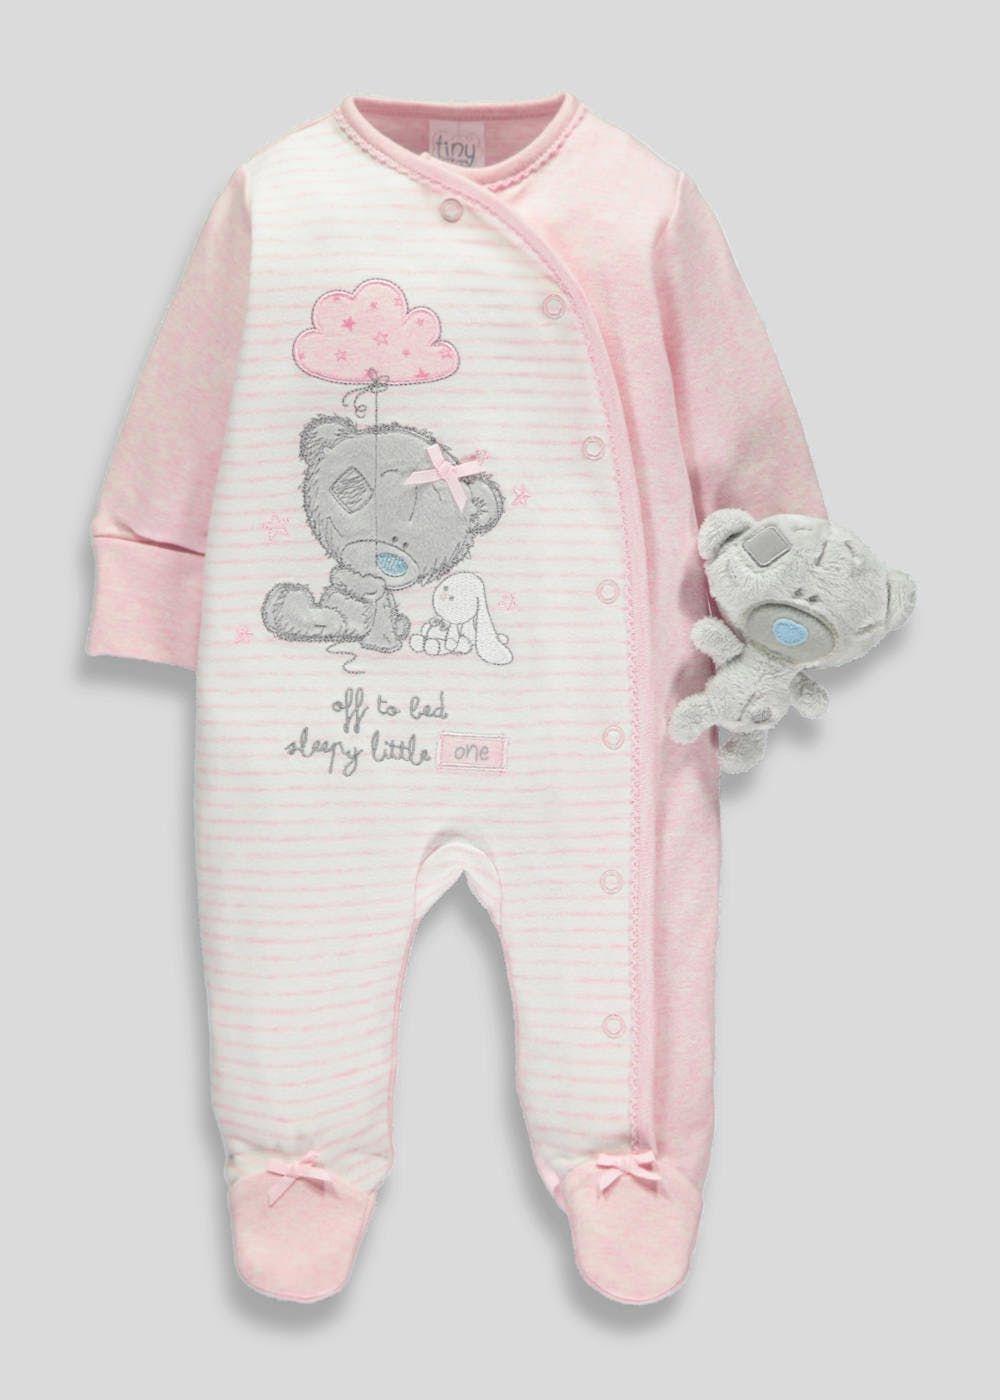 1cbc091b4c1 Girls Tatty Teddy Sleepsuit Set (Tiny Baby-9mths)